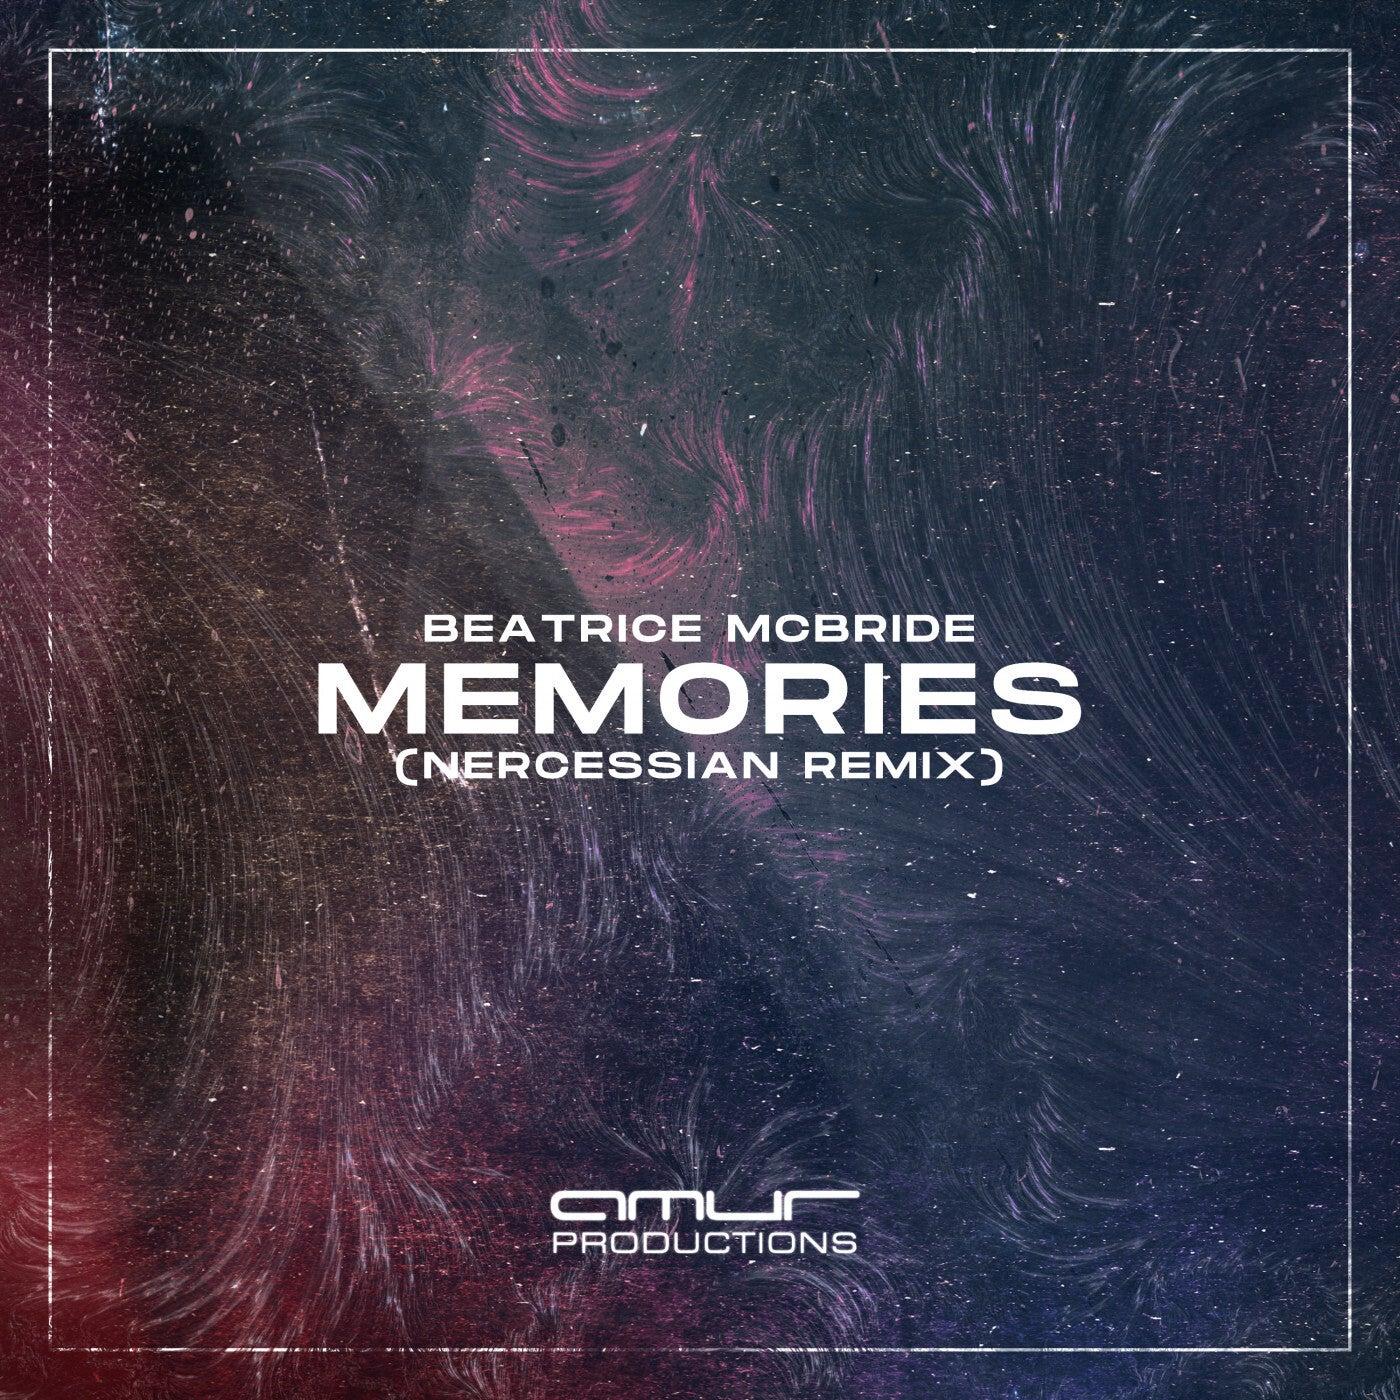 Memories (Nercessian Remix)